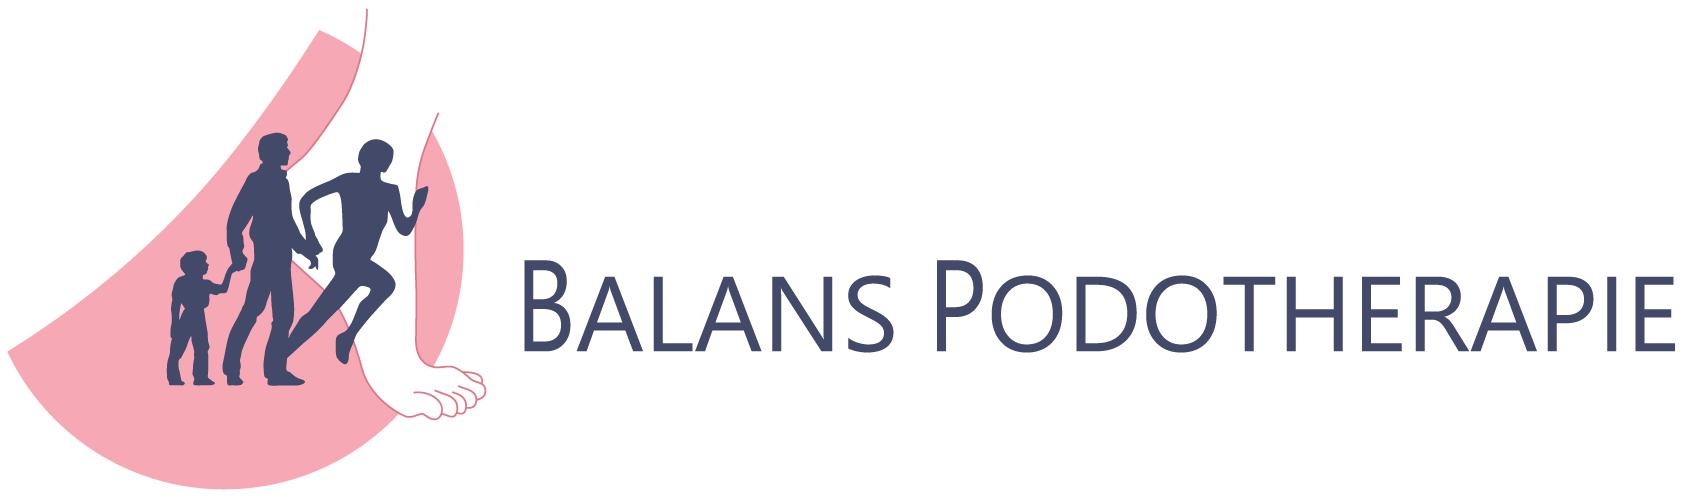 Balans Podotherapie – Best – Oirschot